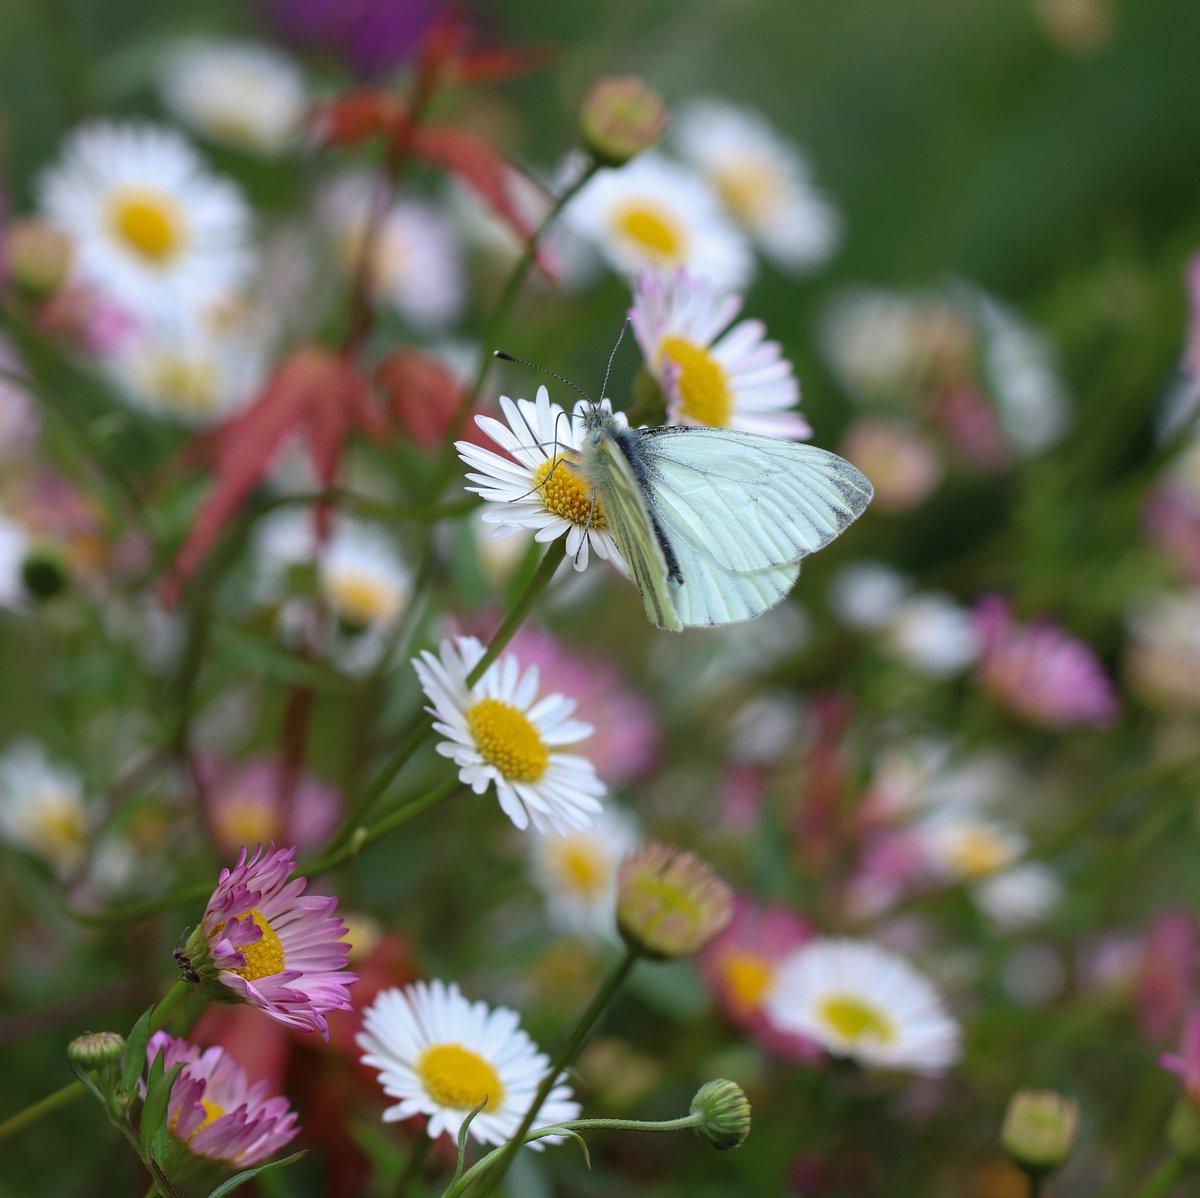 Pretty little Green-veined white #butterfly (Pieris napi) in #mylittlegarden this afternoon pic.twitter.com/CESlda0zW5